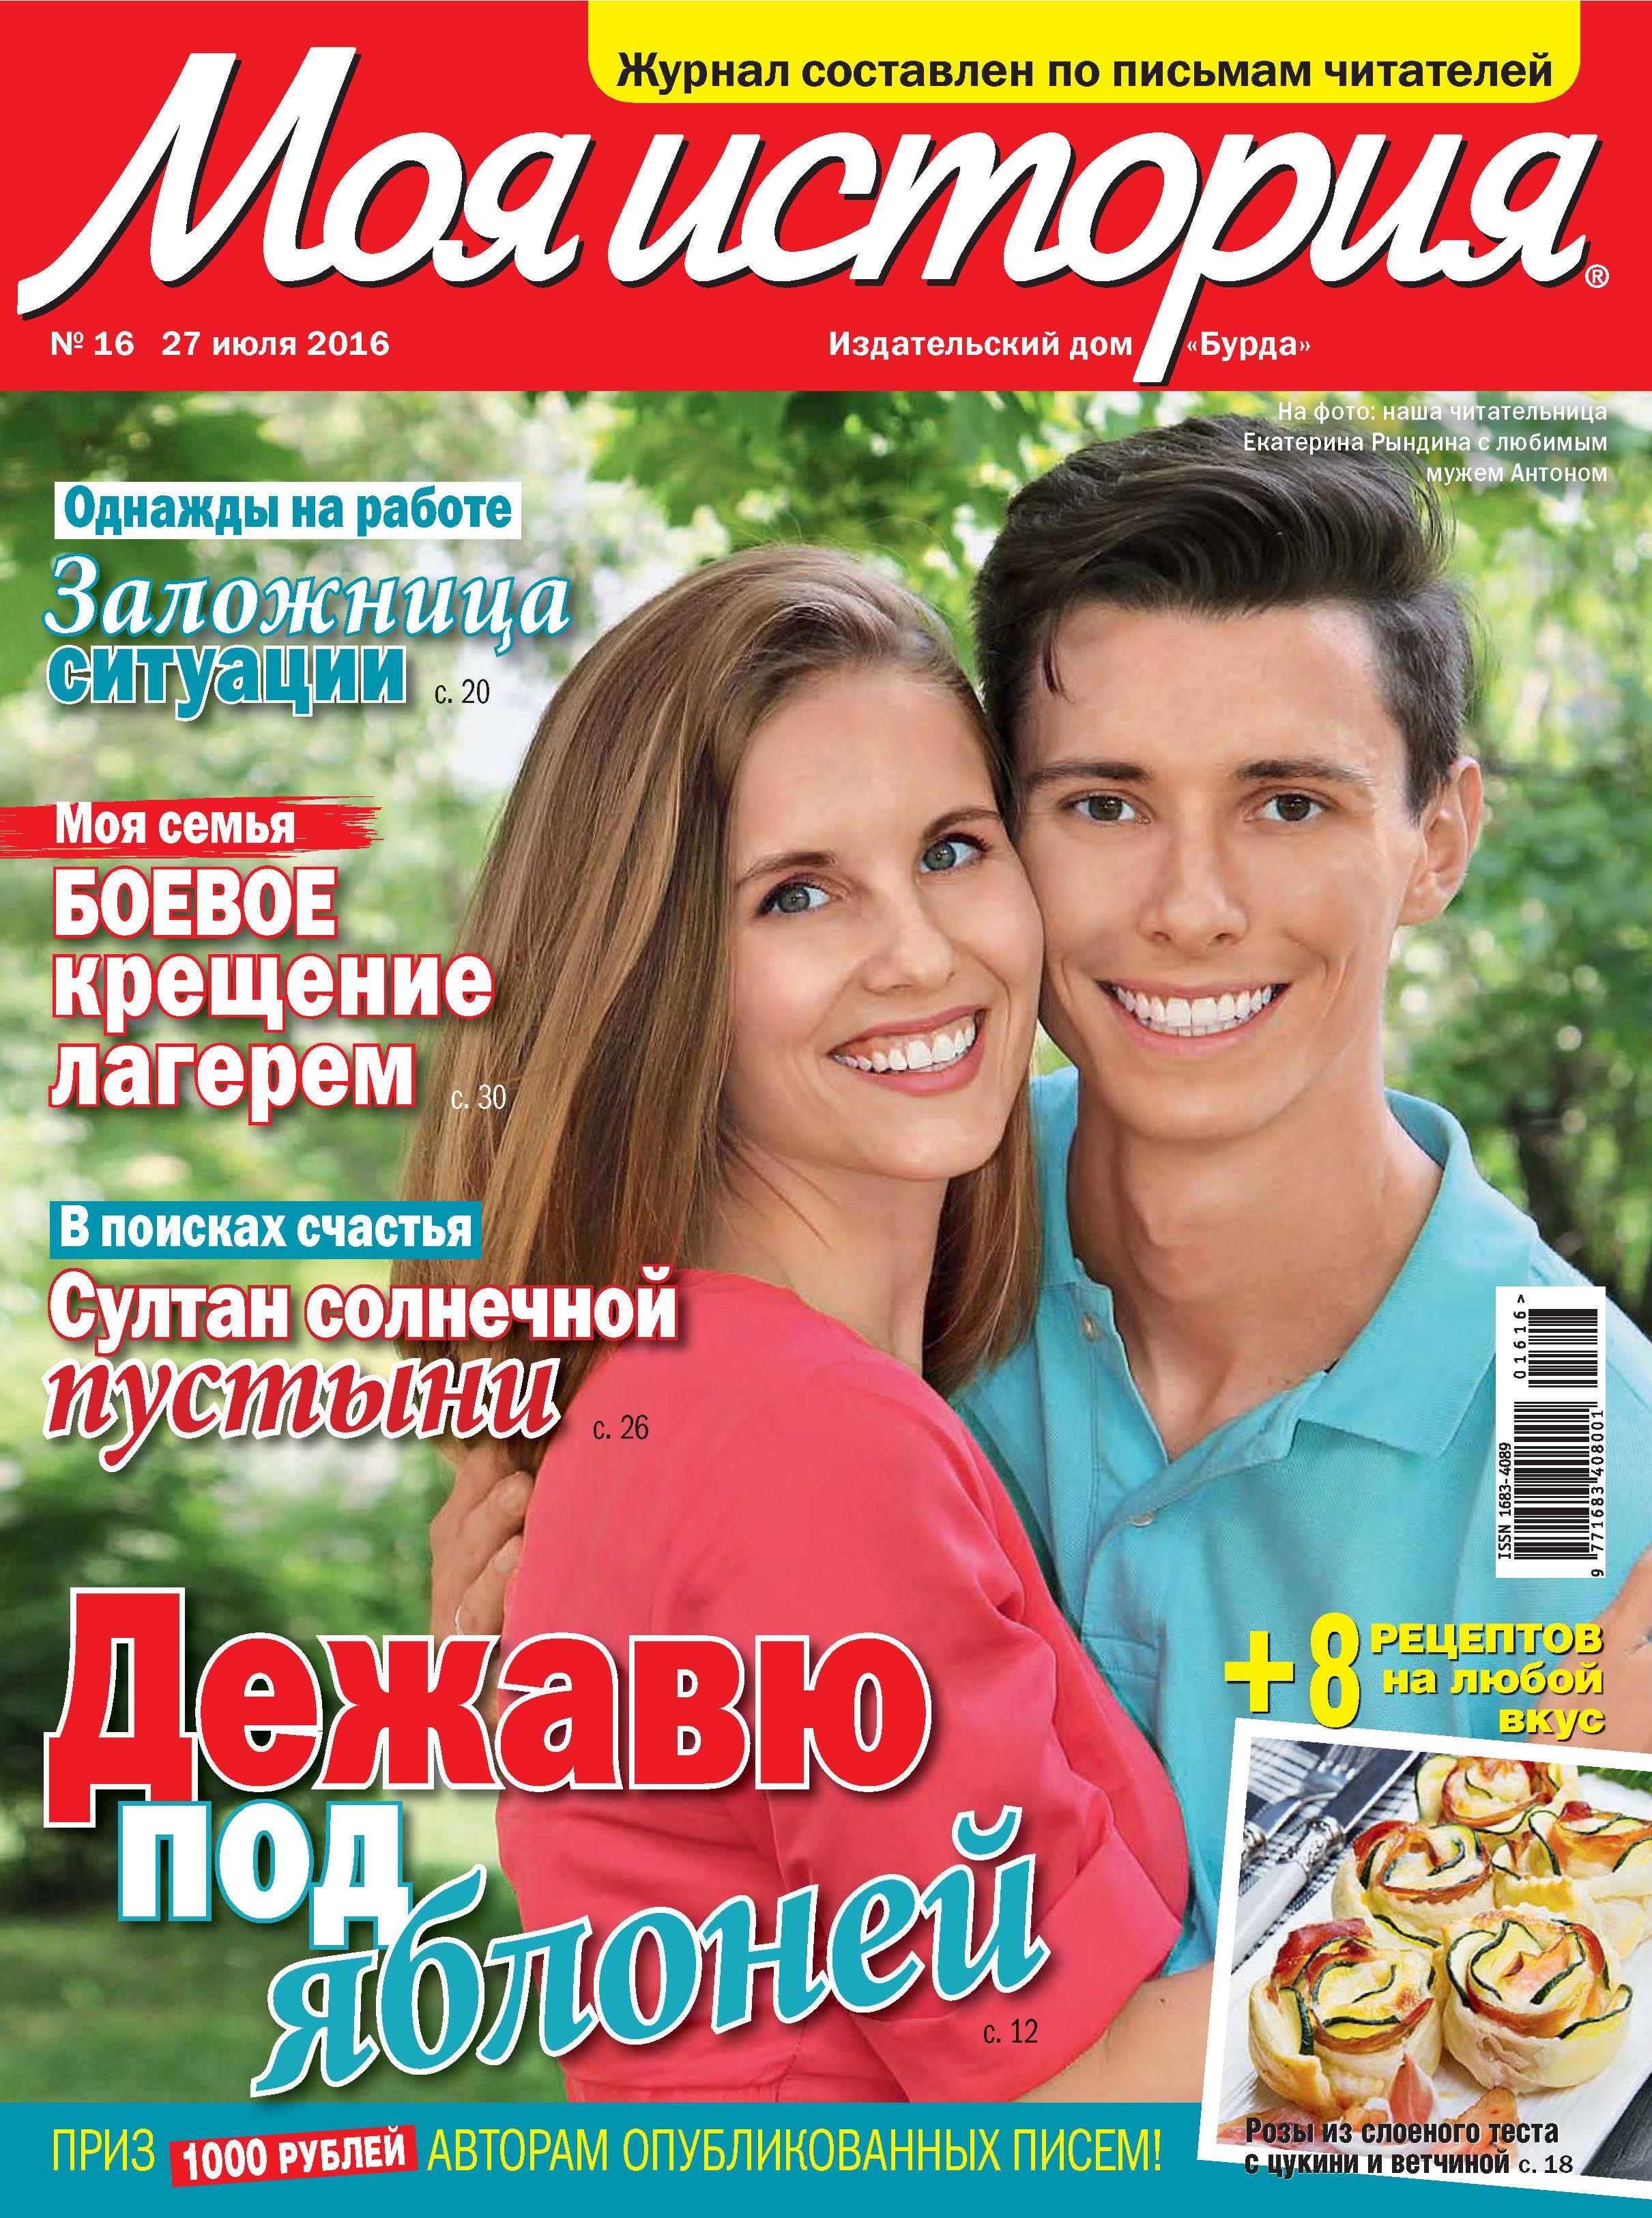 ИД «Бурда» Журнал «Моя история» №16/2016 ид бурда журнал моя история 24 2016